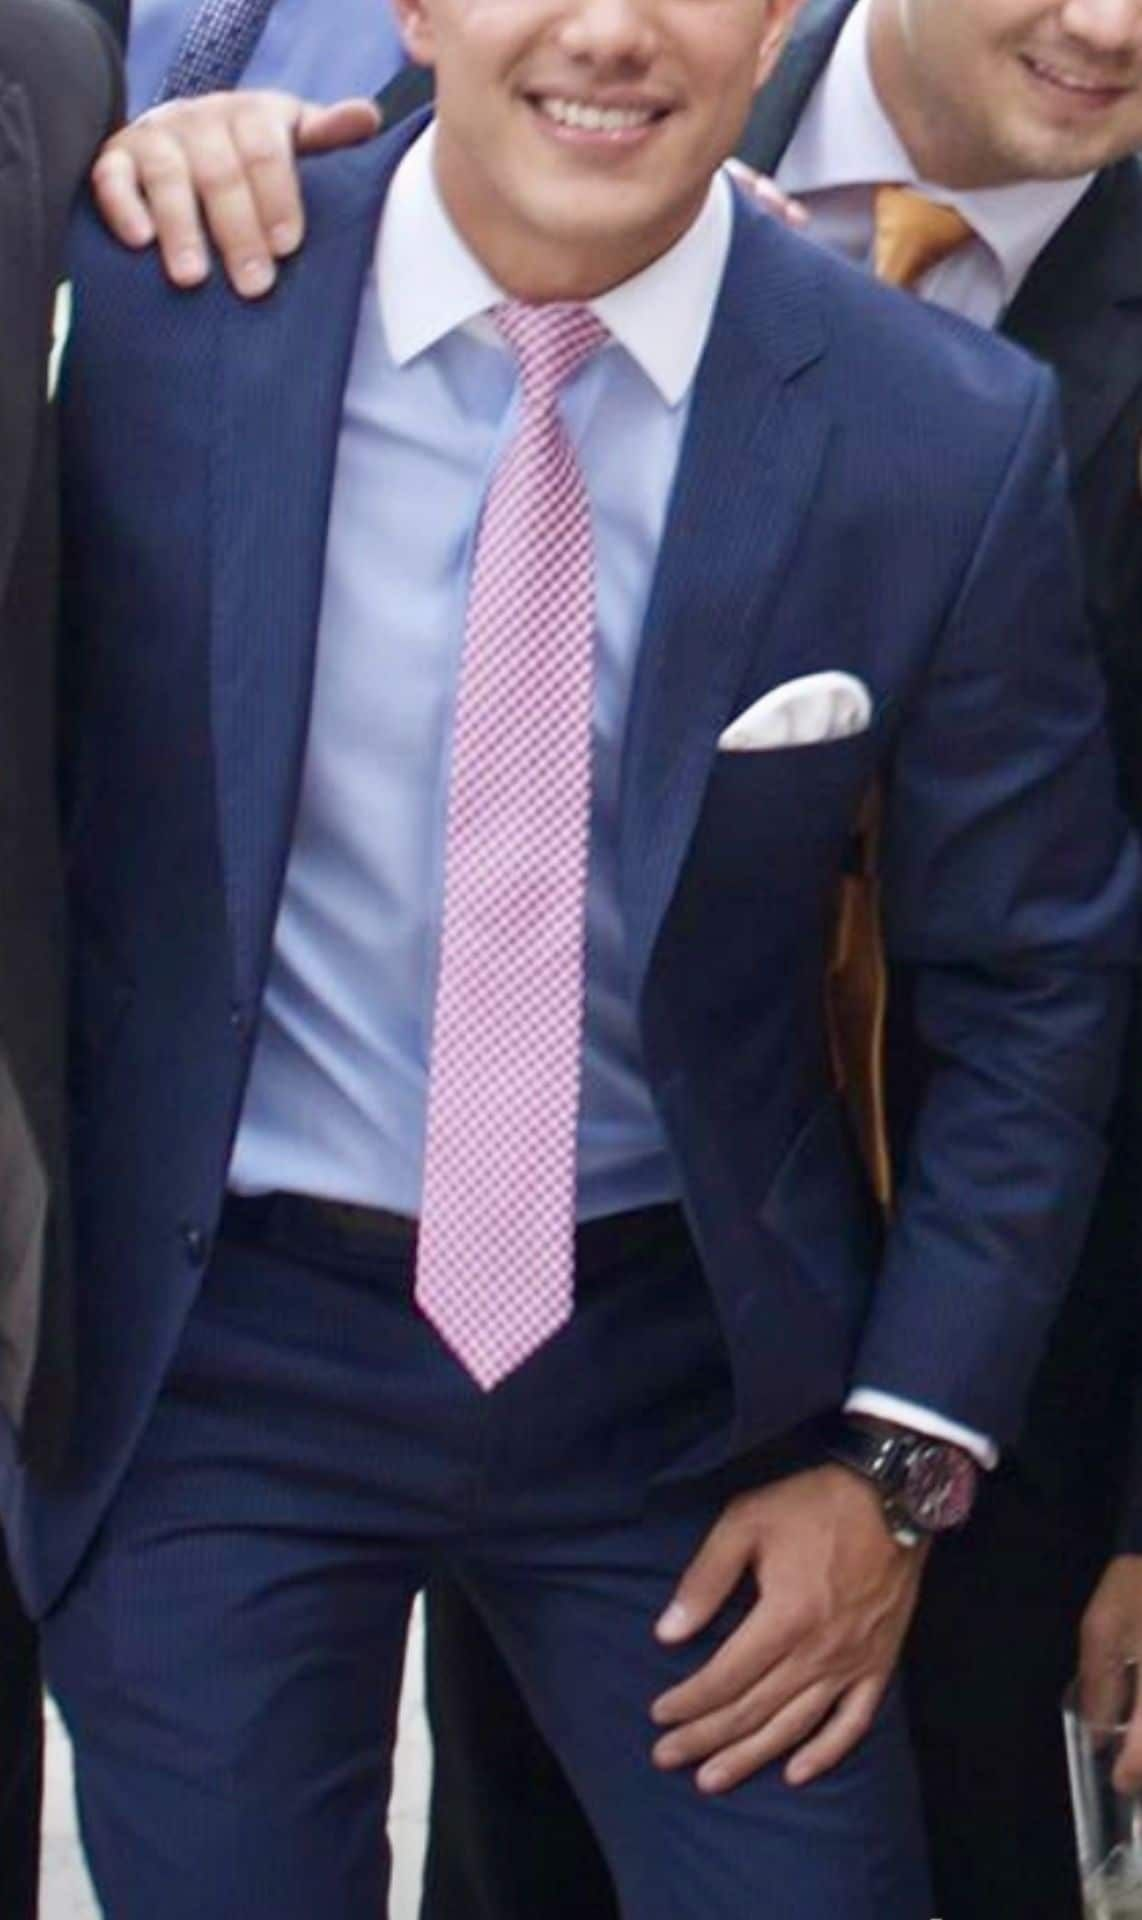 How To Match Your Tie With A Blue Shirt The Ultimate Guide Blue Suit Men Best Blue Suits For Men Navy Blue Suit Men